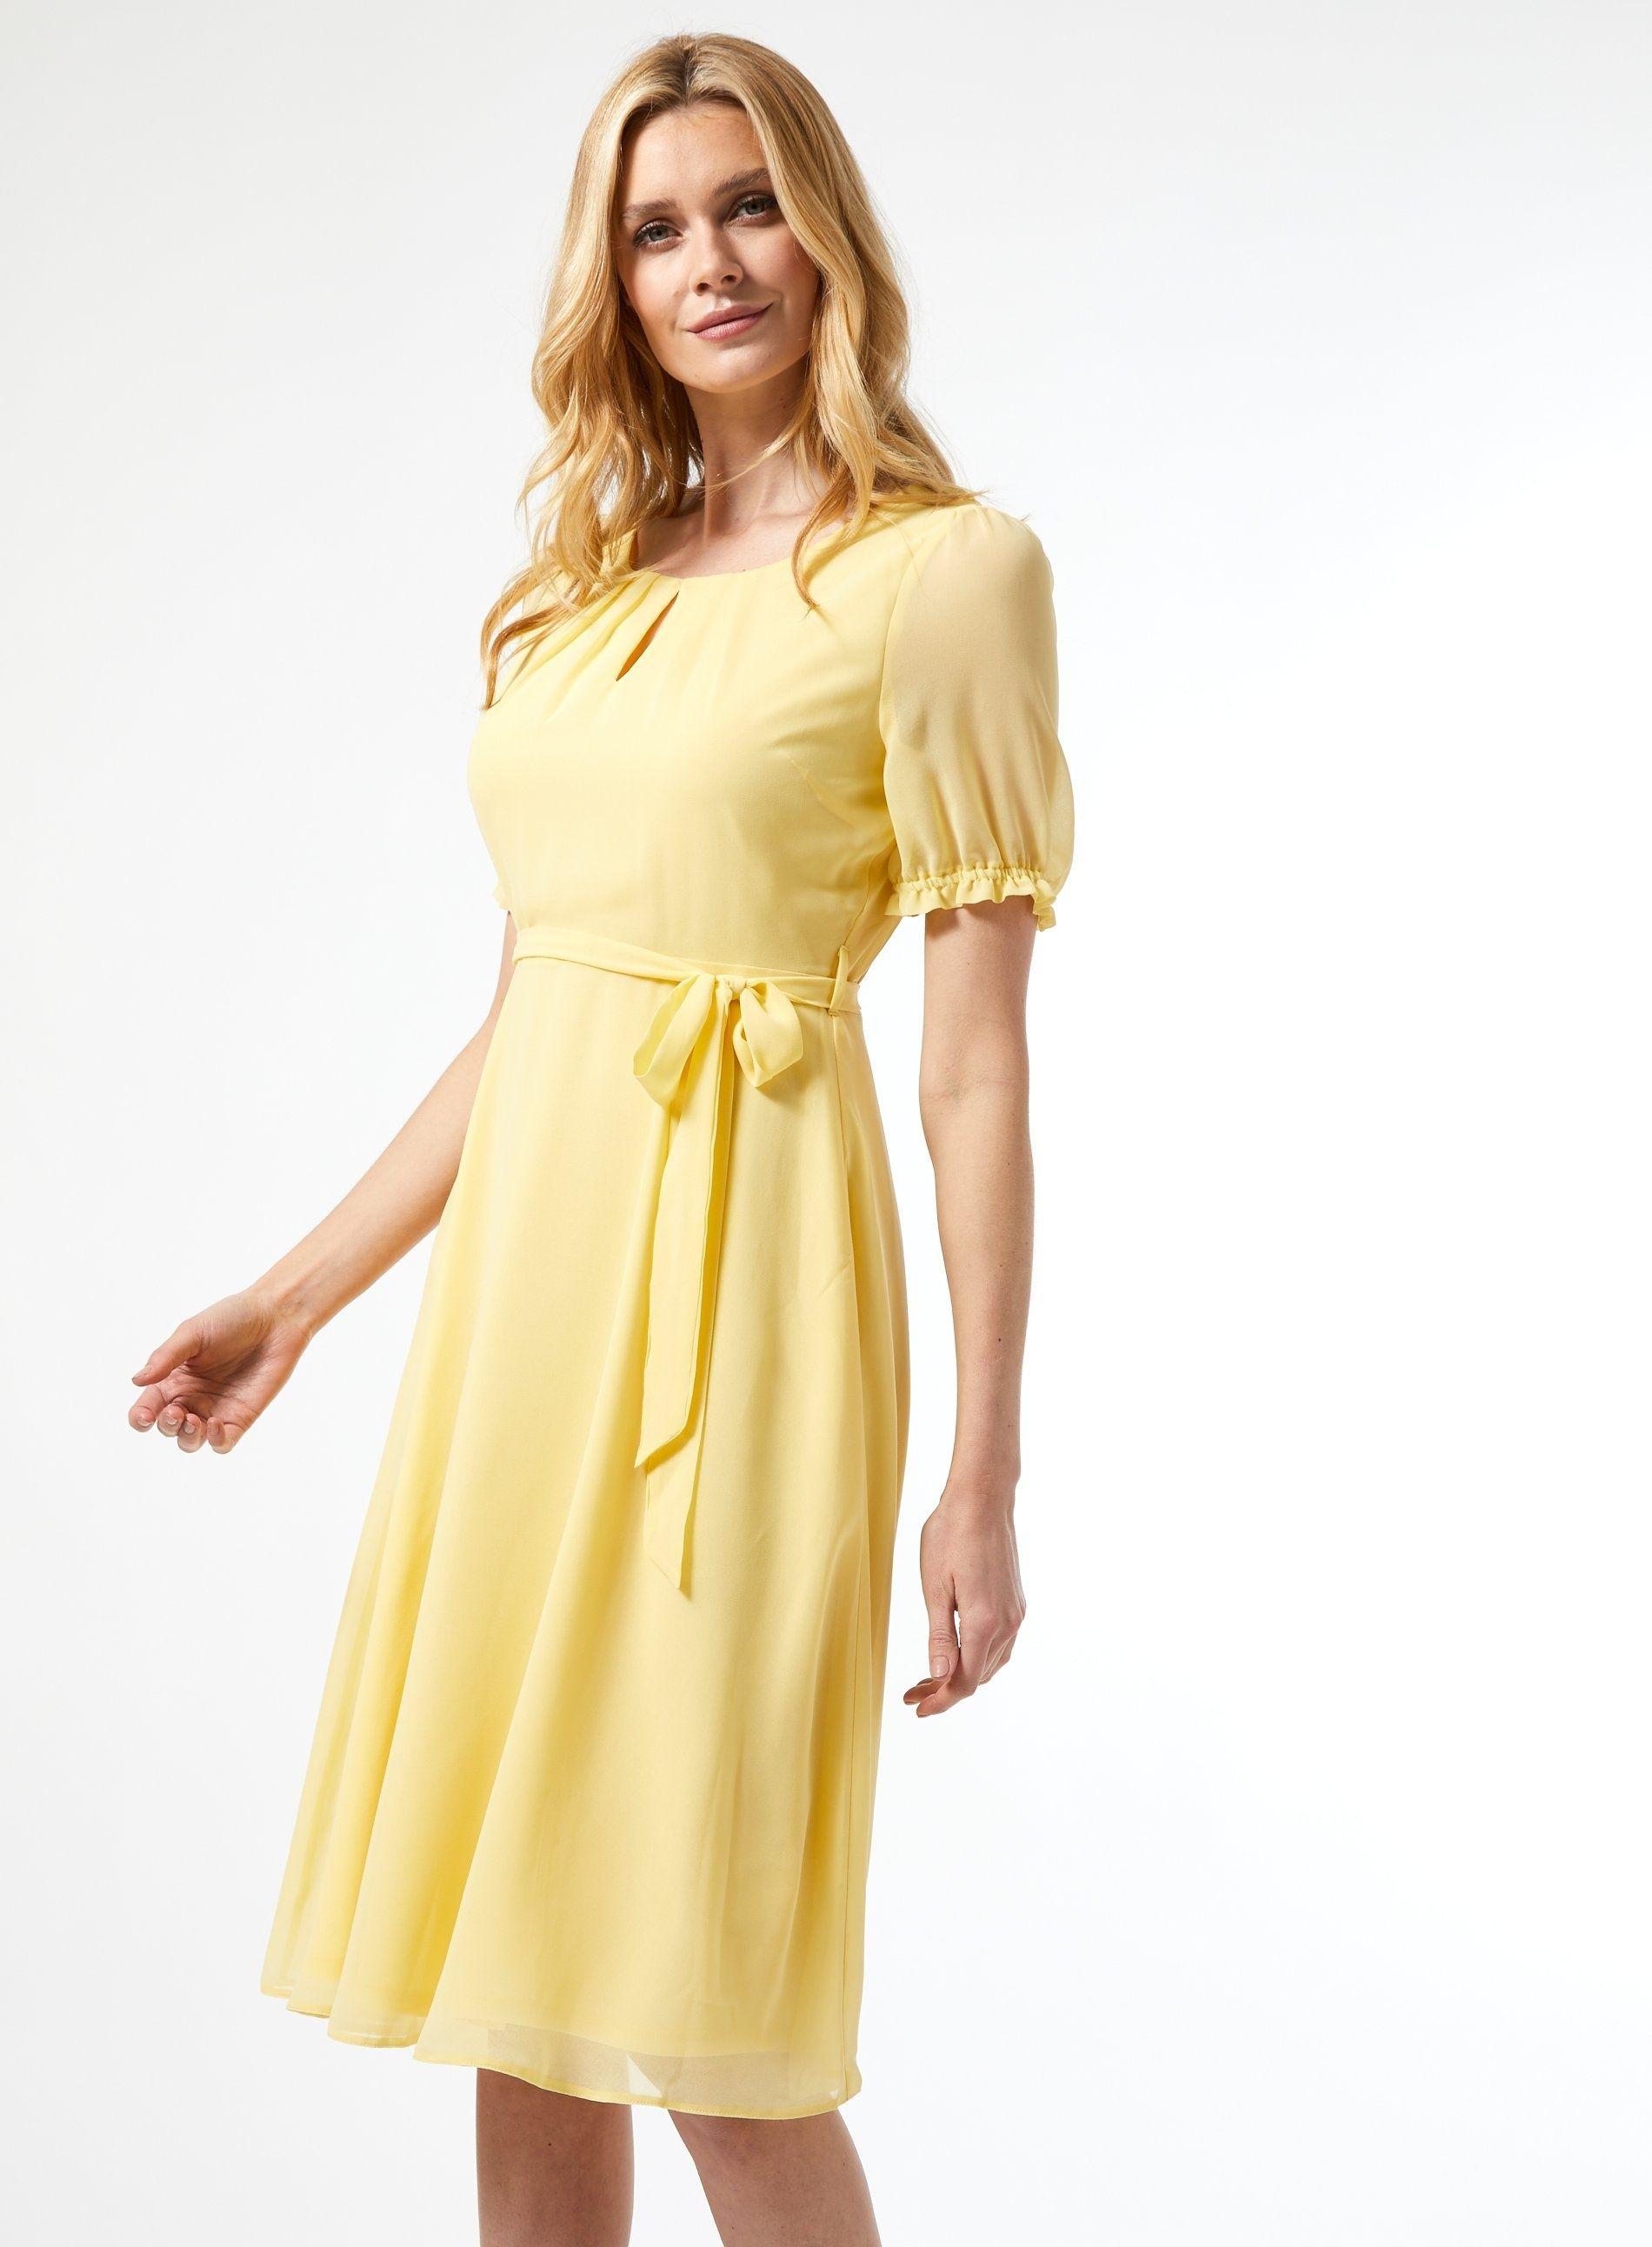 Dorothy Perkins Womens Billie & Blossom Yellow Puff Sleeve Midi Dress Scoop Neck